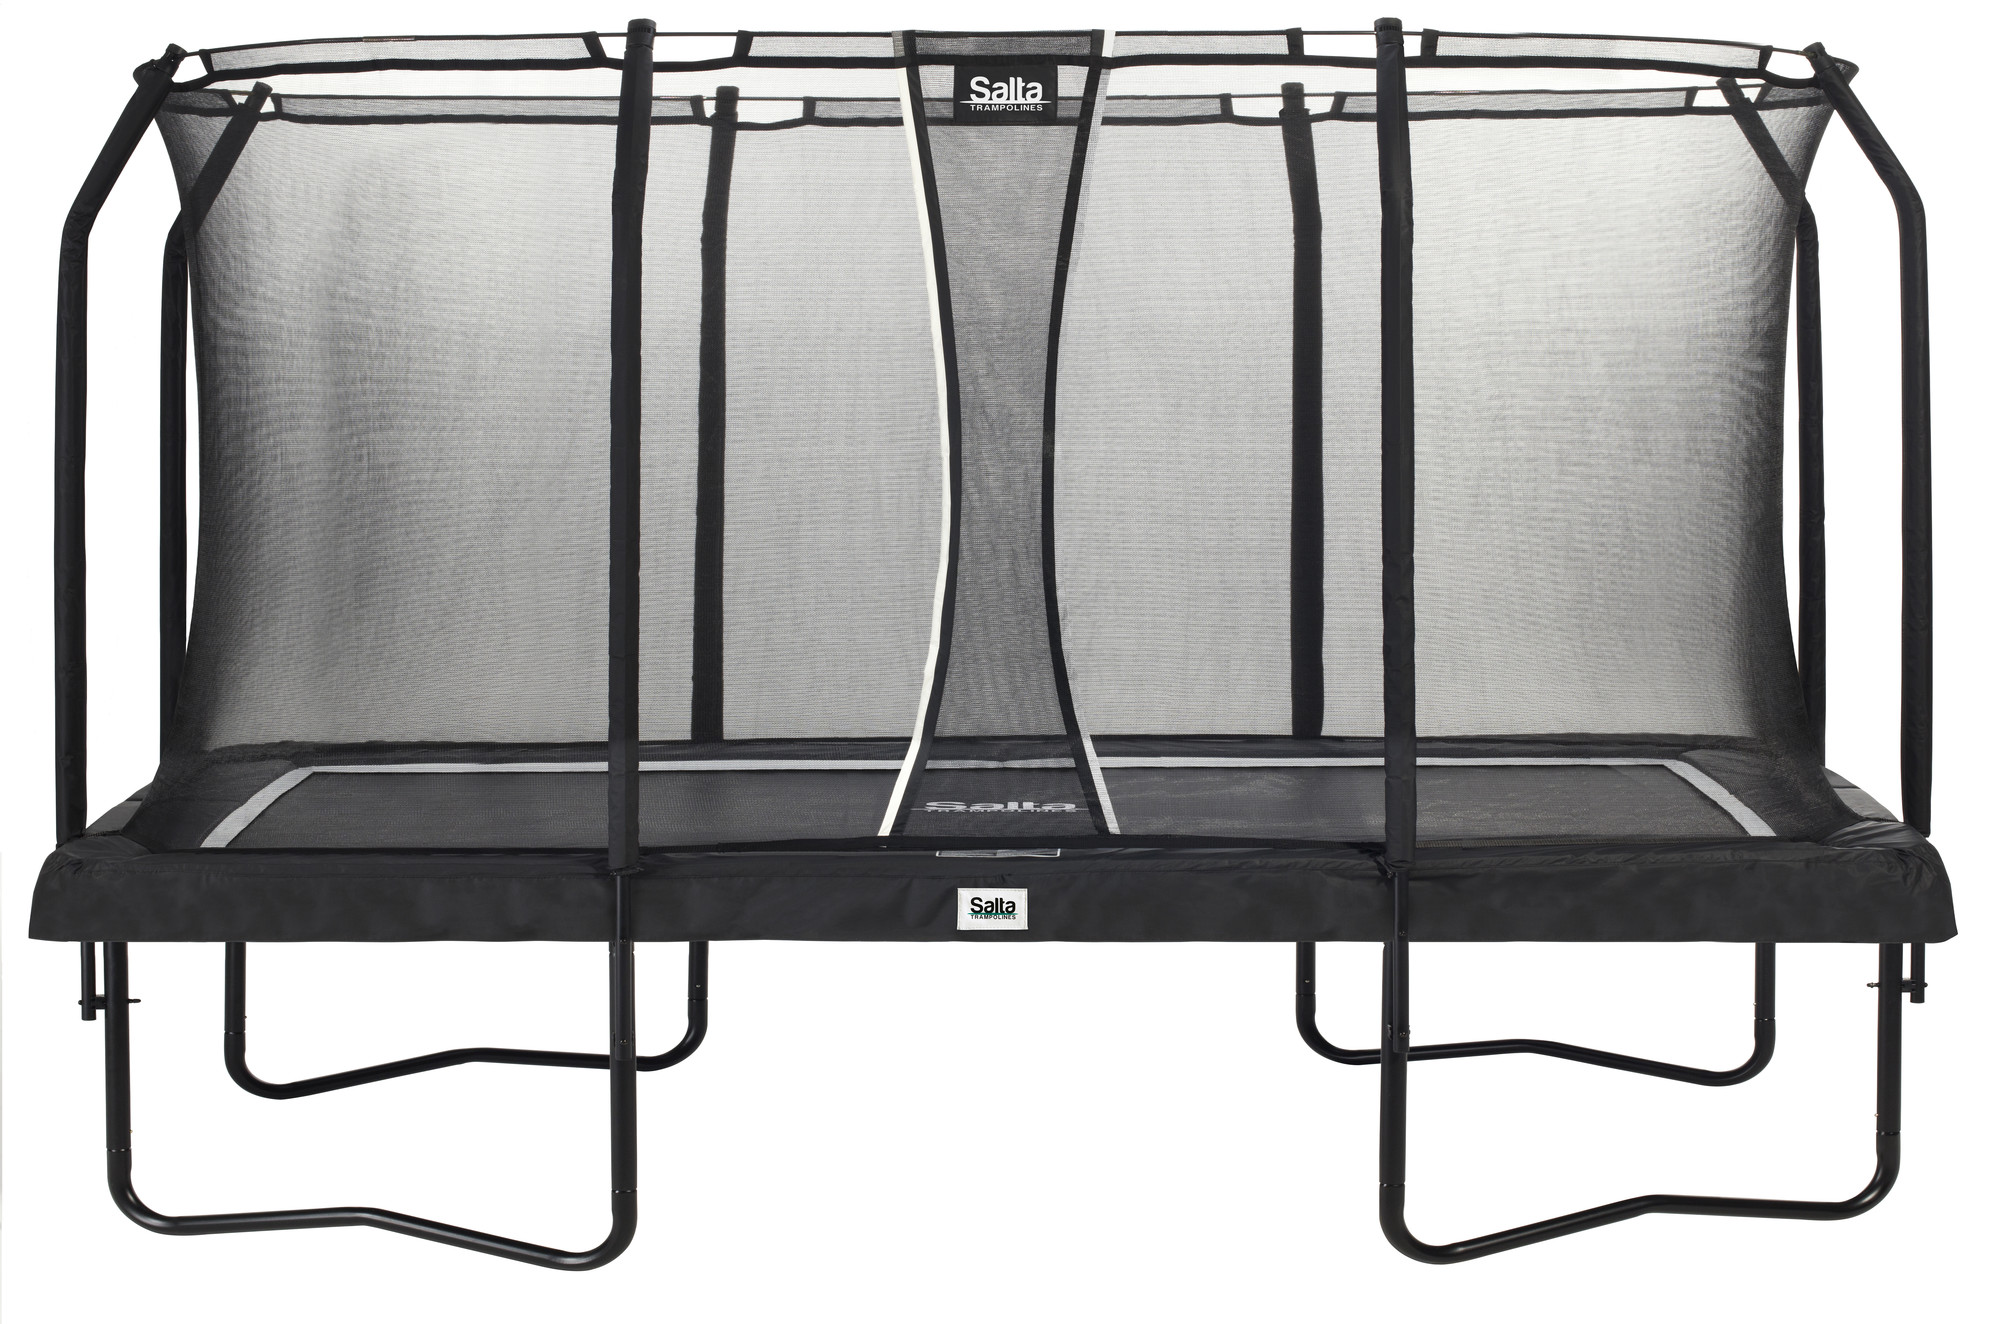 Van Wohi Salta Premium Black Edition 244x396cm (5363) Prijsvergelijk nu!